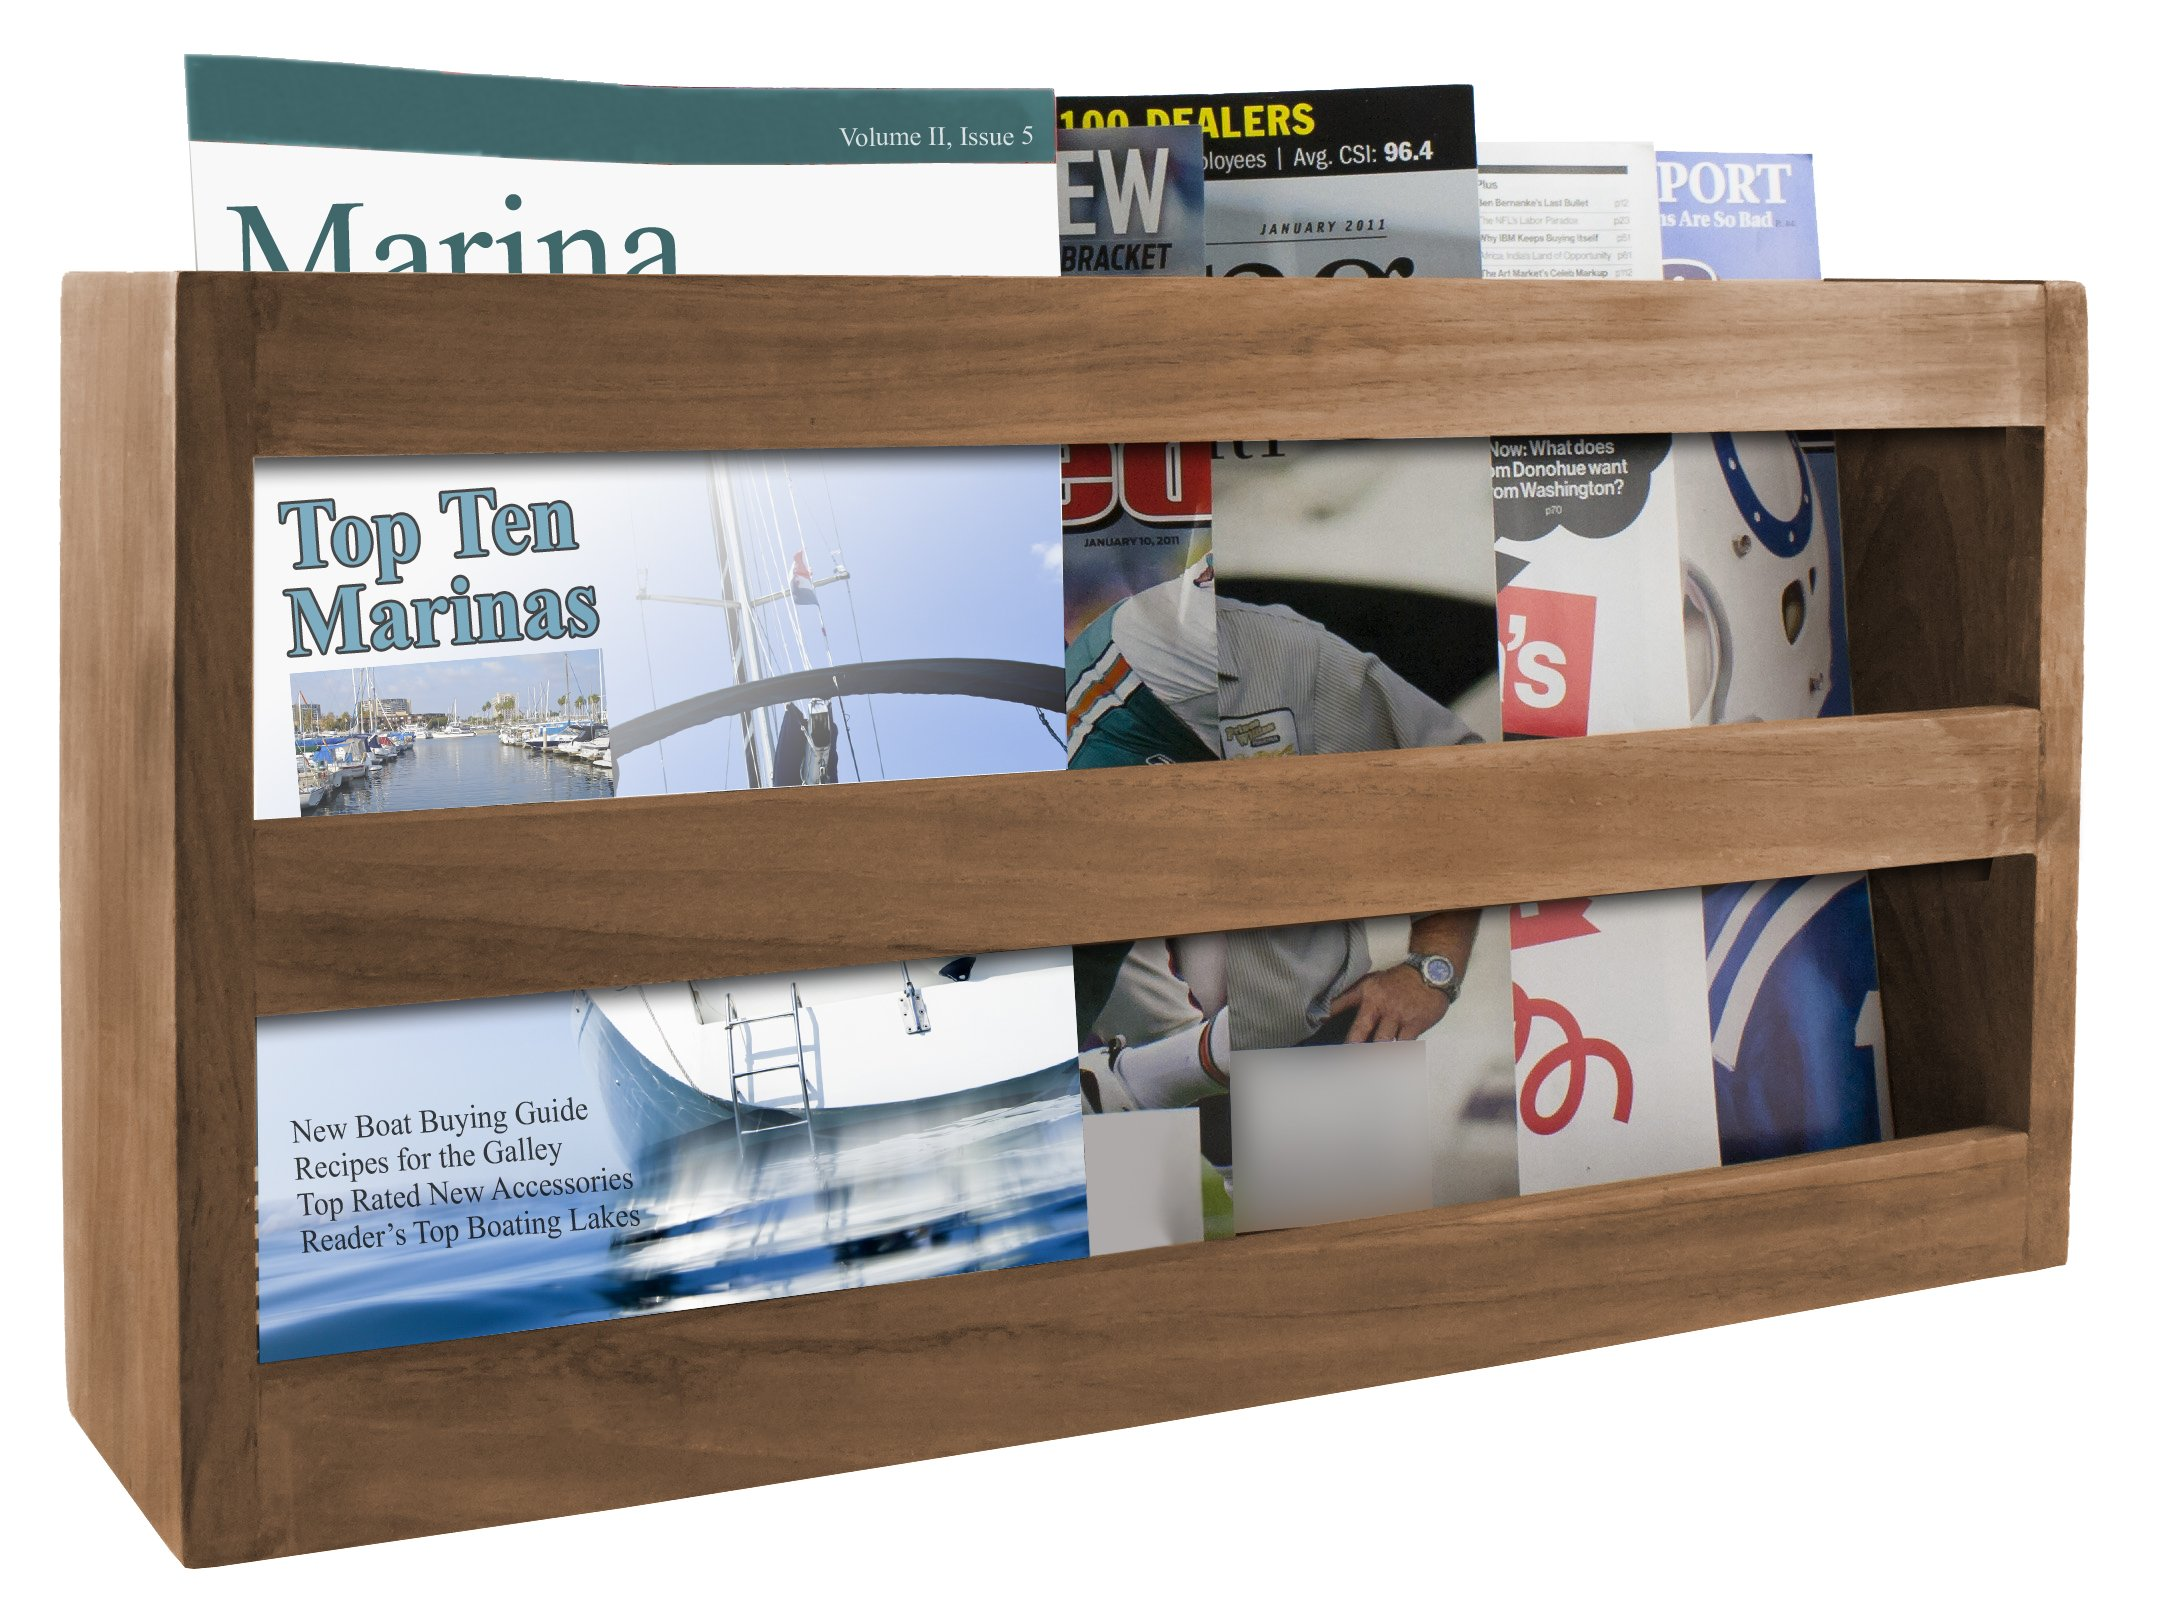 SeaTeak 62508 Double-Wide Teak Magazine Rack, Wall Mount or Free Standing by SeaTeak